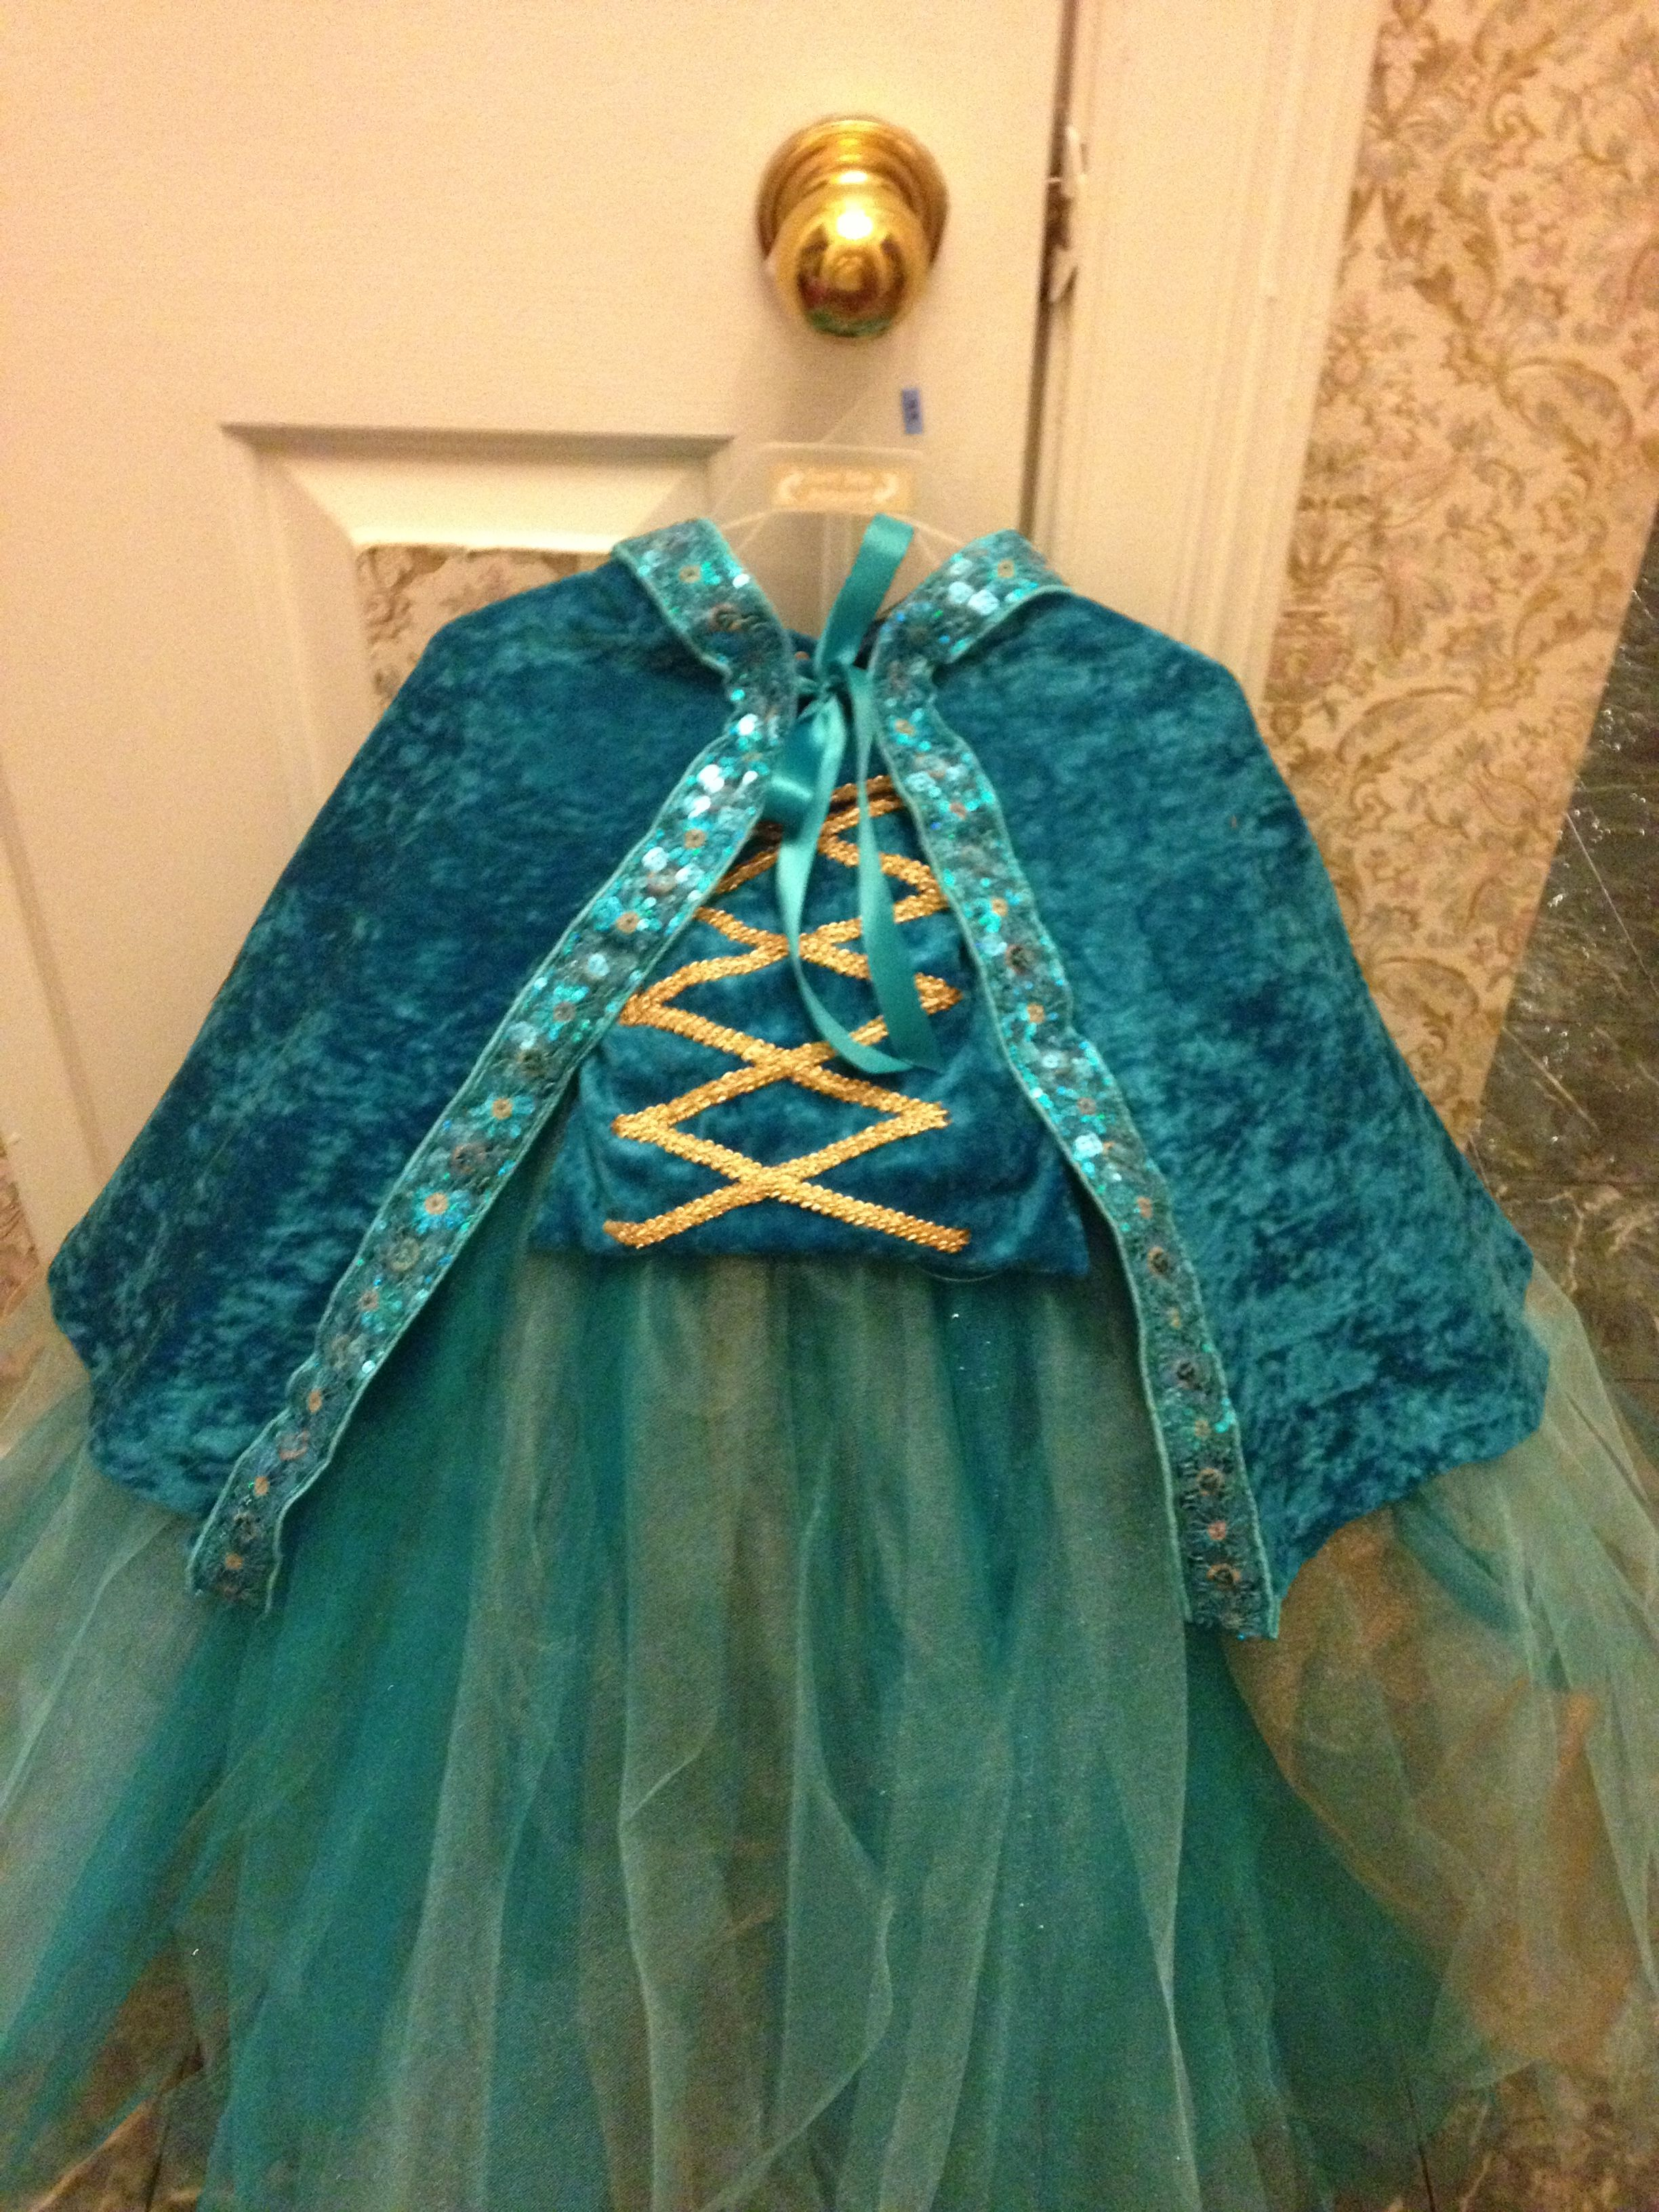 Diy Merida Costume Daaecacdcfaeacac